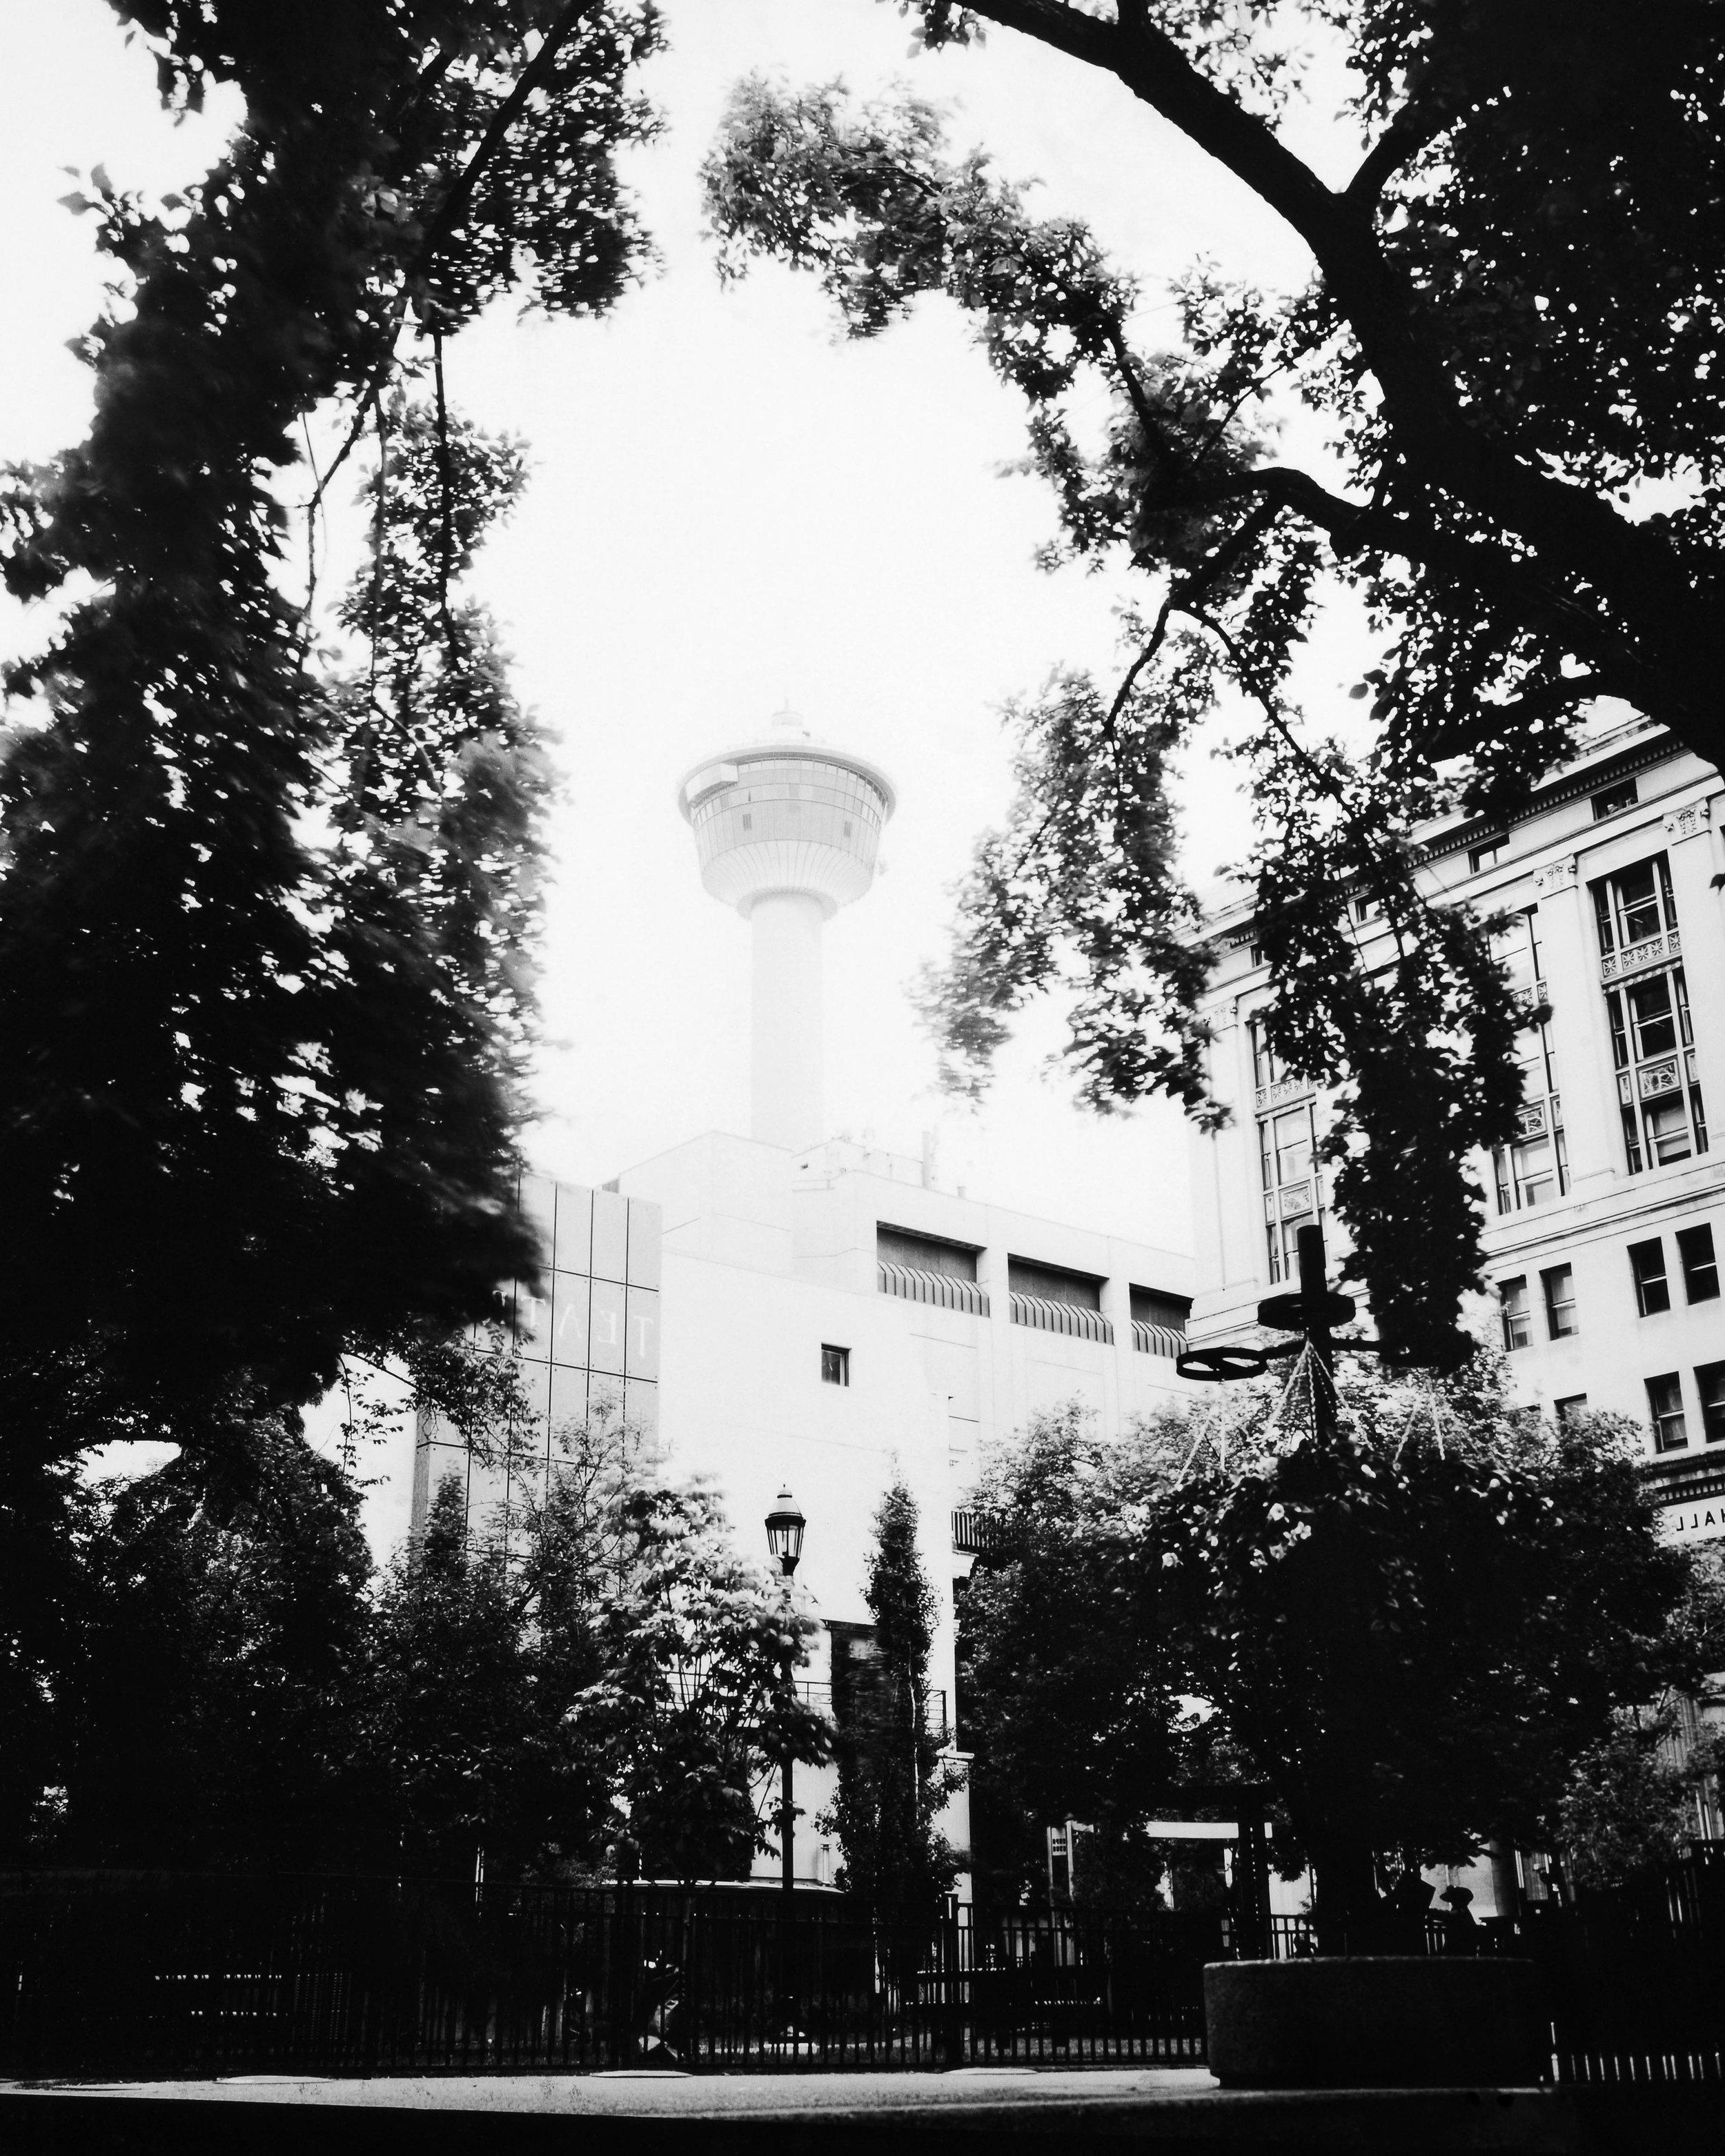 Reproduction - Calgary Tower - Print - No Border.jpg